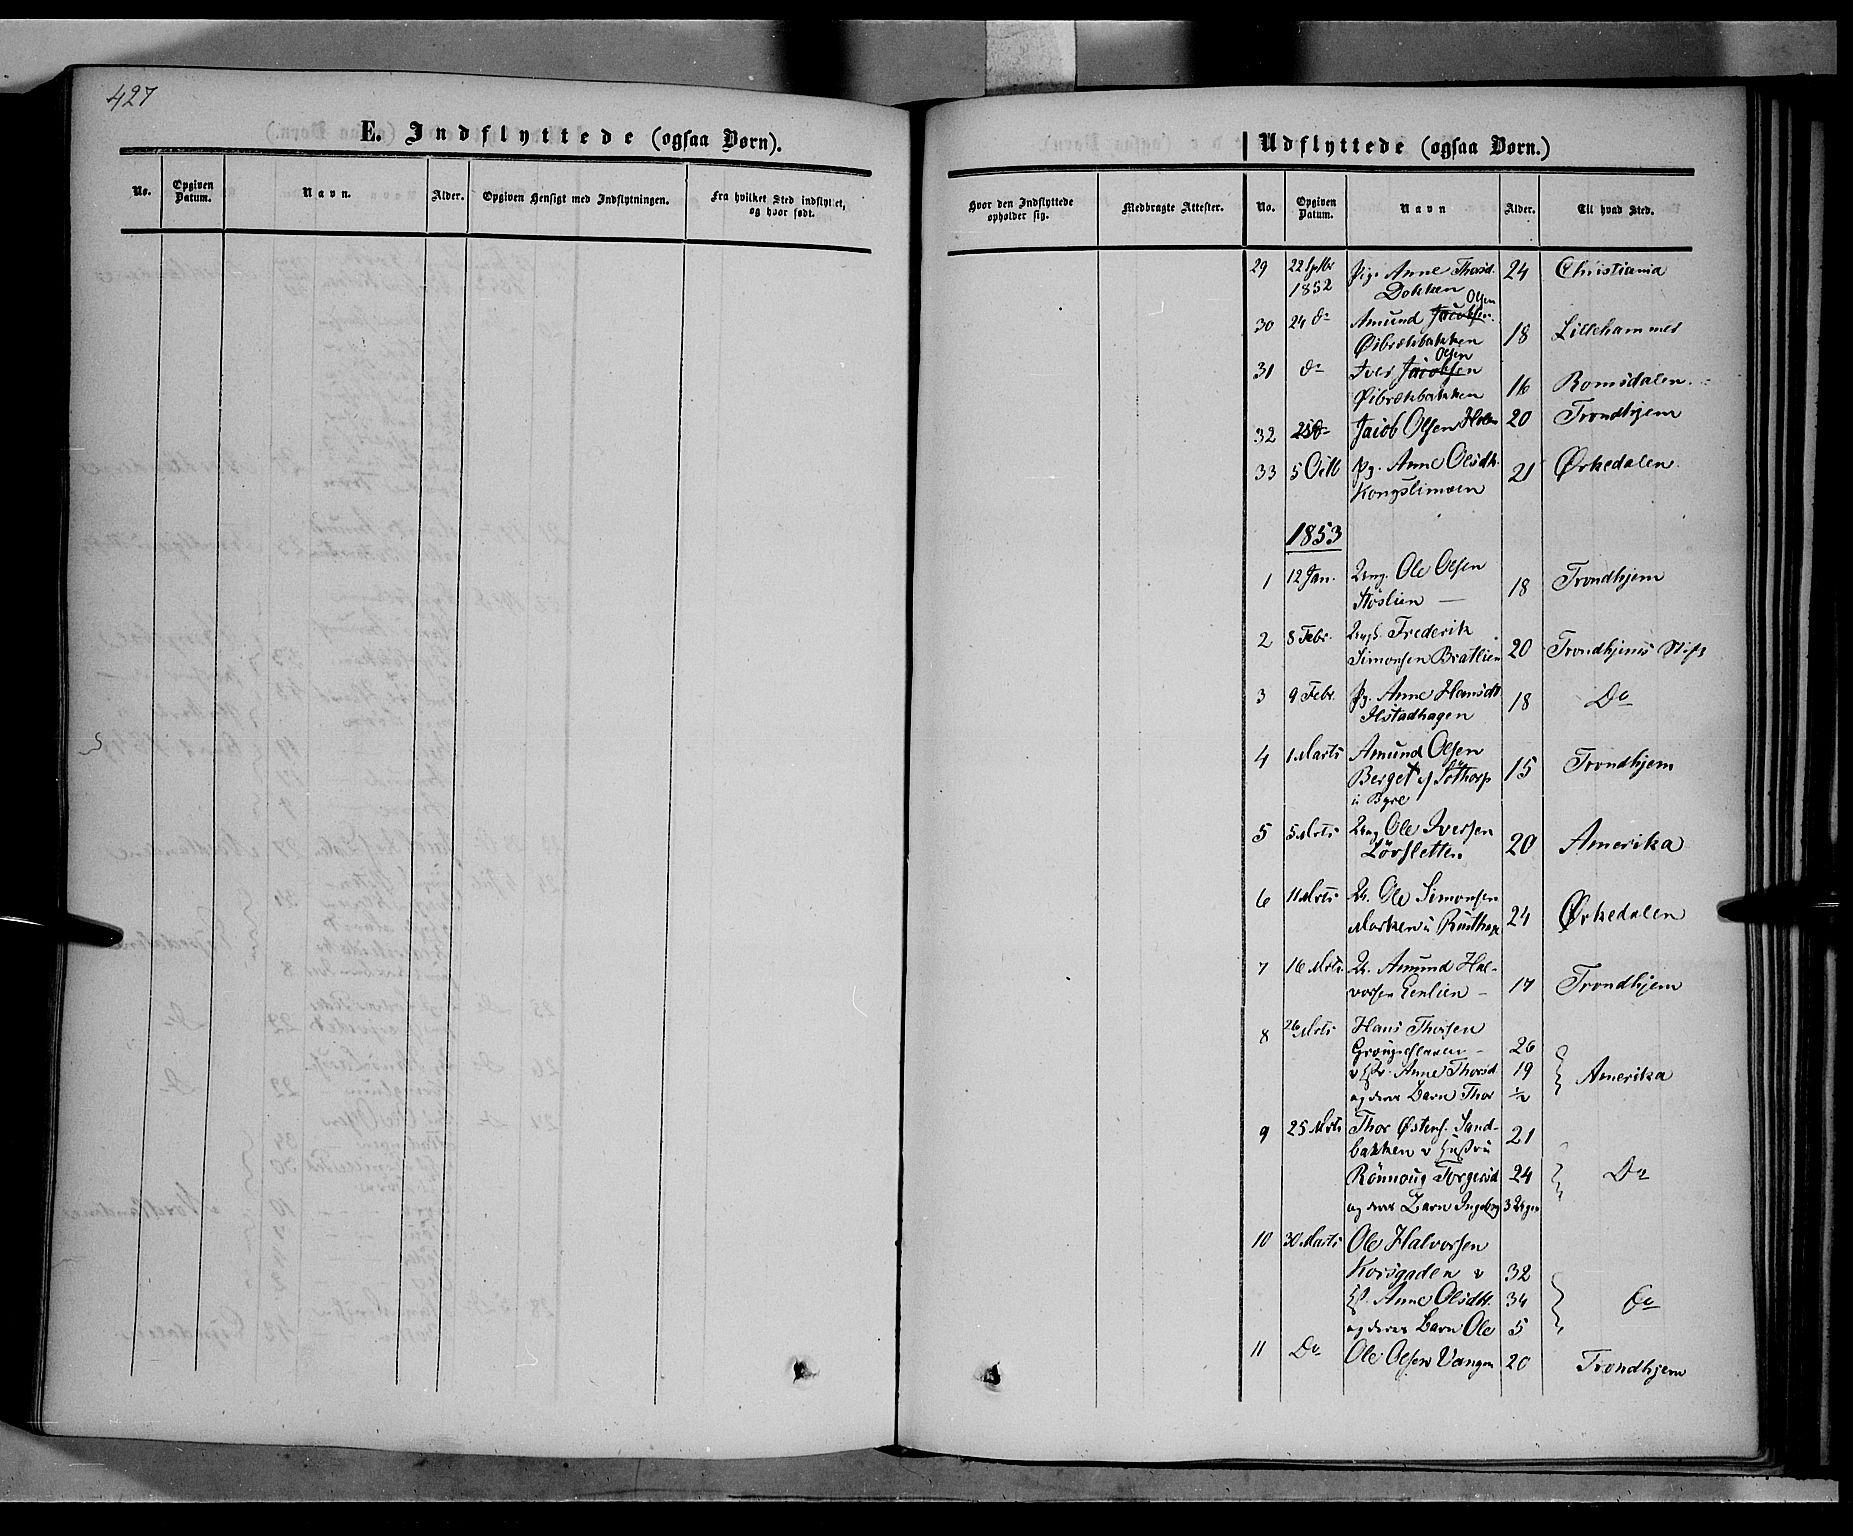 SAH, Nord-Fron prestekontor, Ministerialbok nr. 1, 1851-1864, s. 427